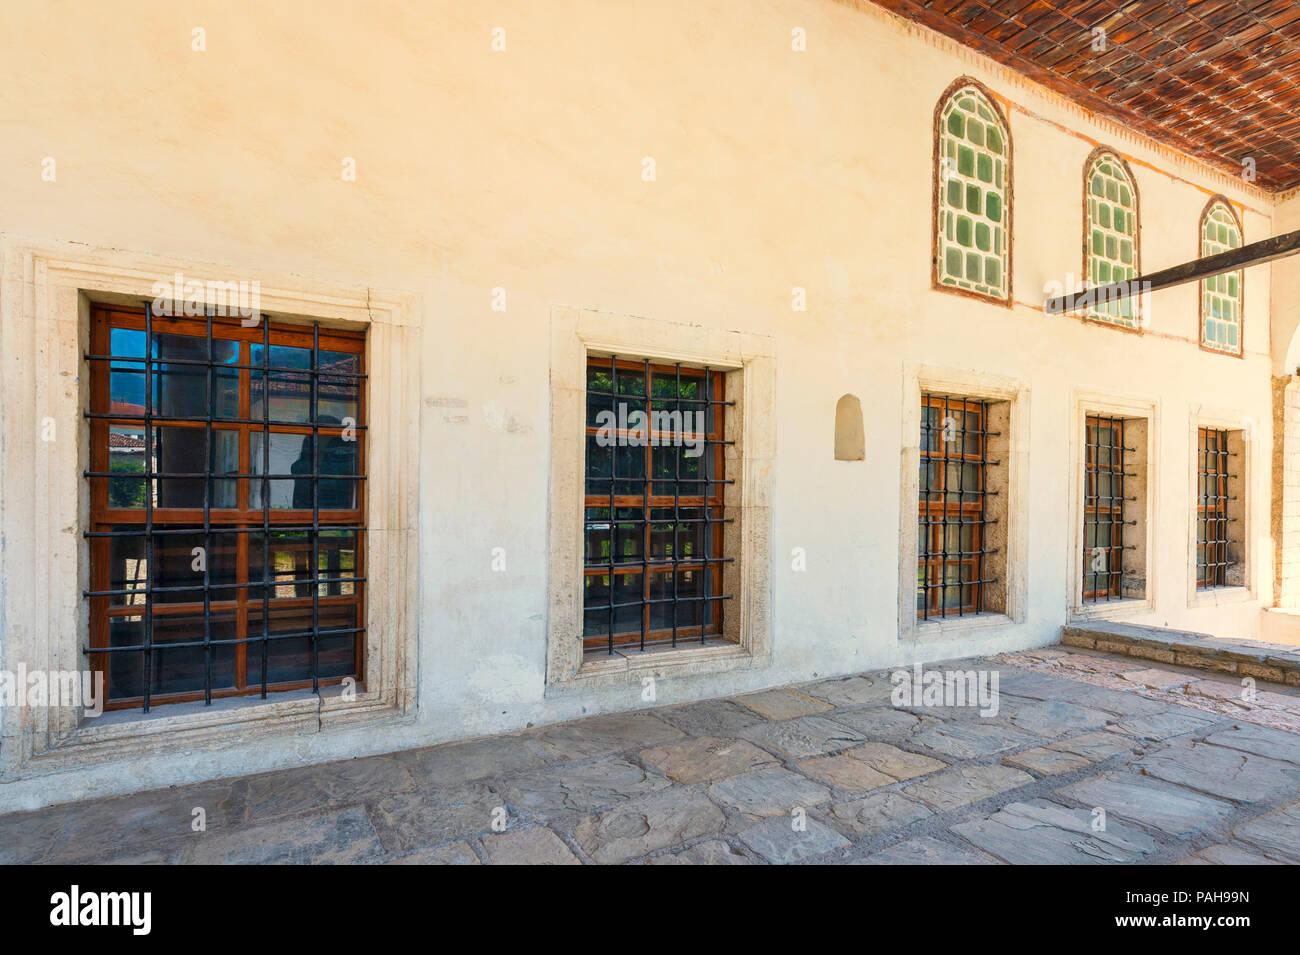 Helveti Teke, Bektashi Sufi shrine, Berat, Albania - Stock Image